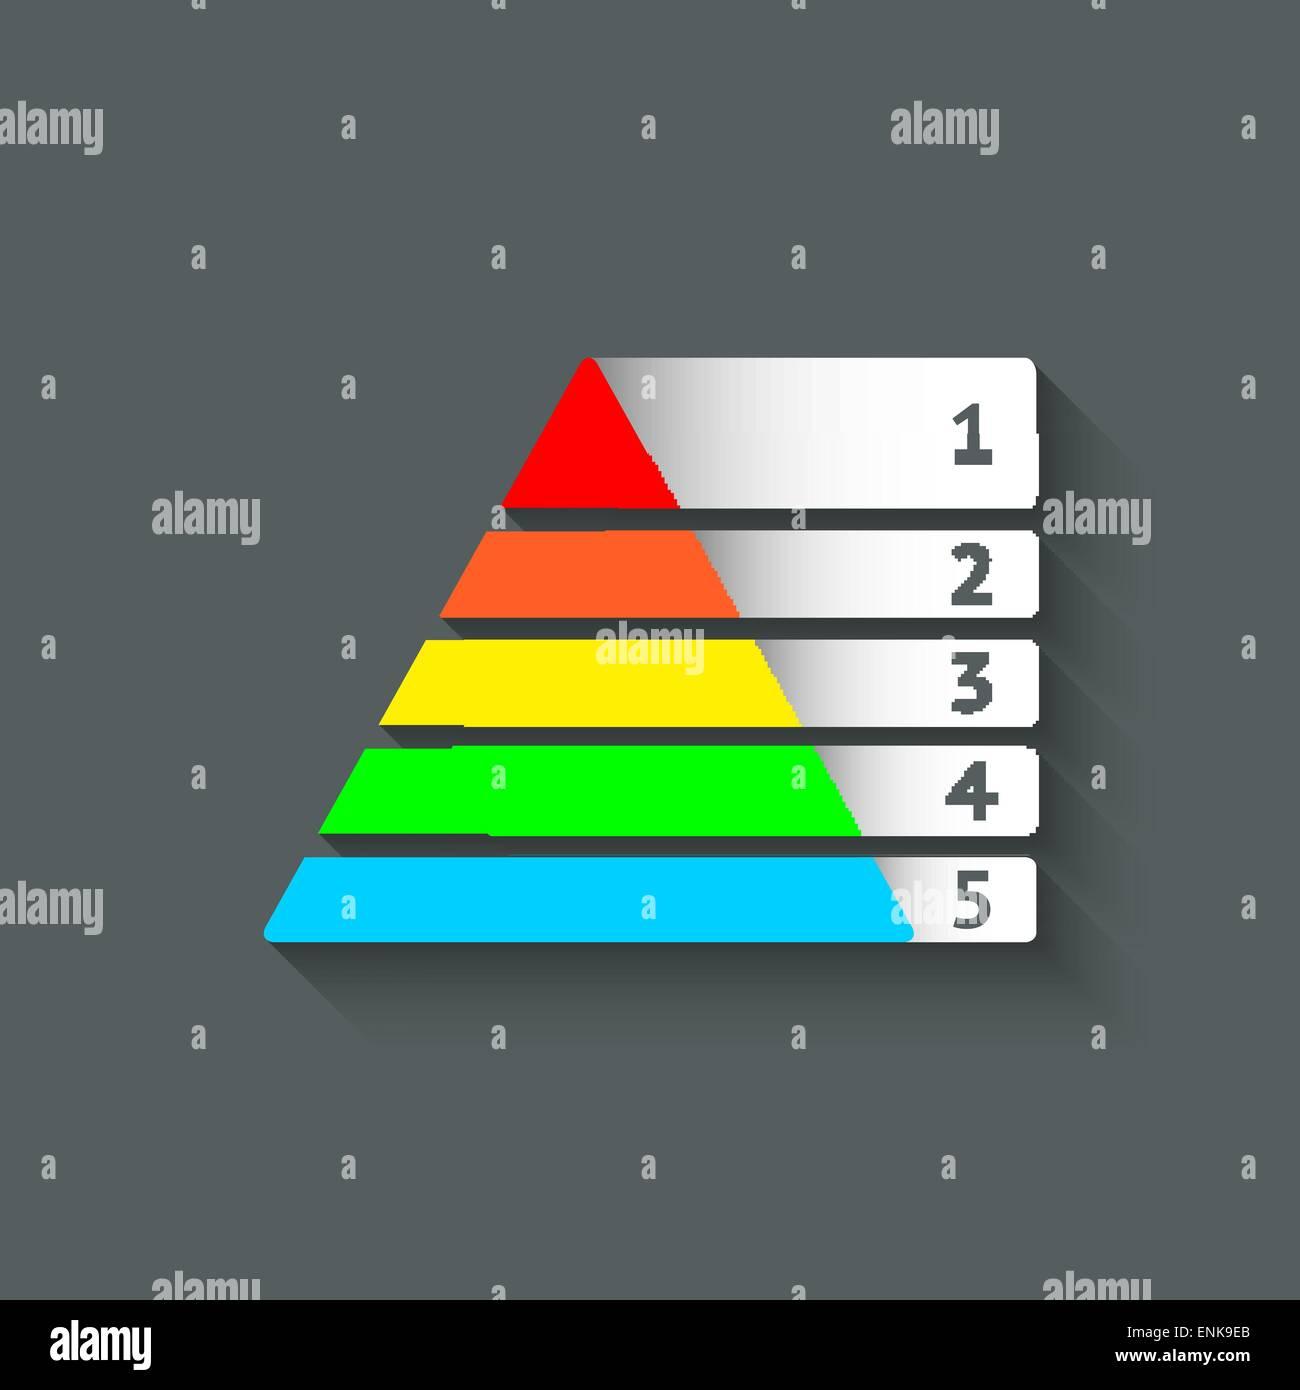 Human Pyramid Stock Vector Images - Alamy